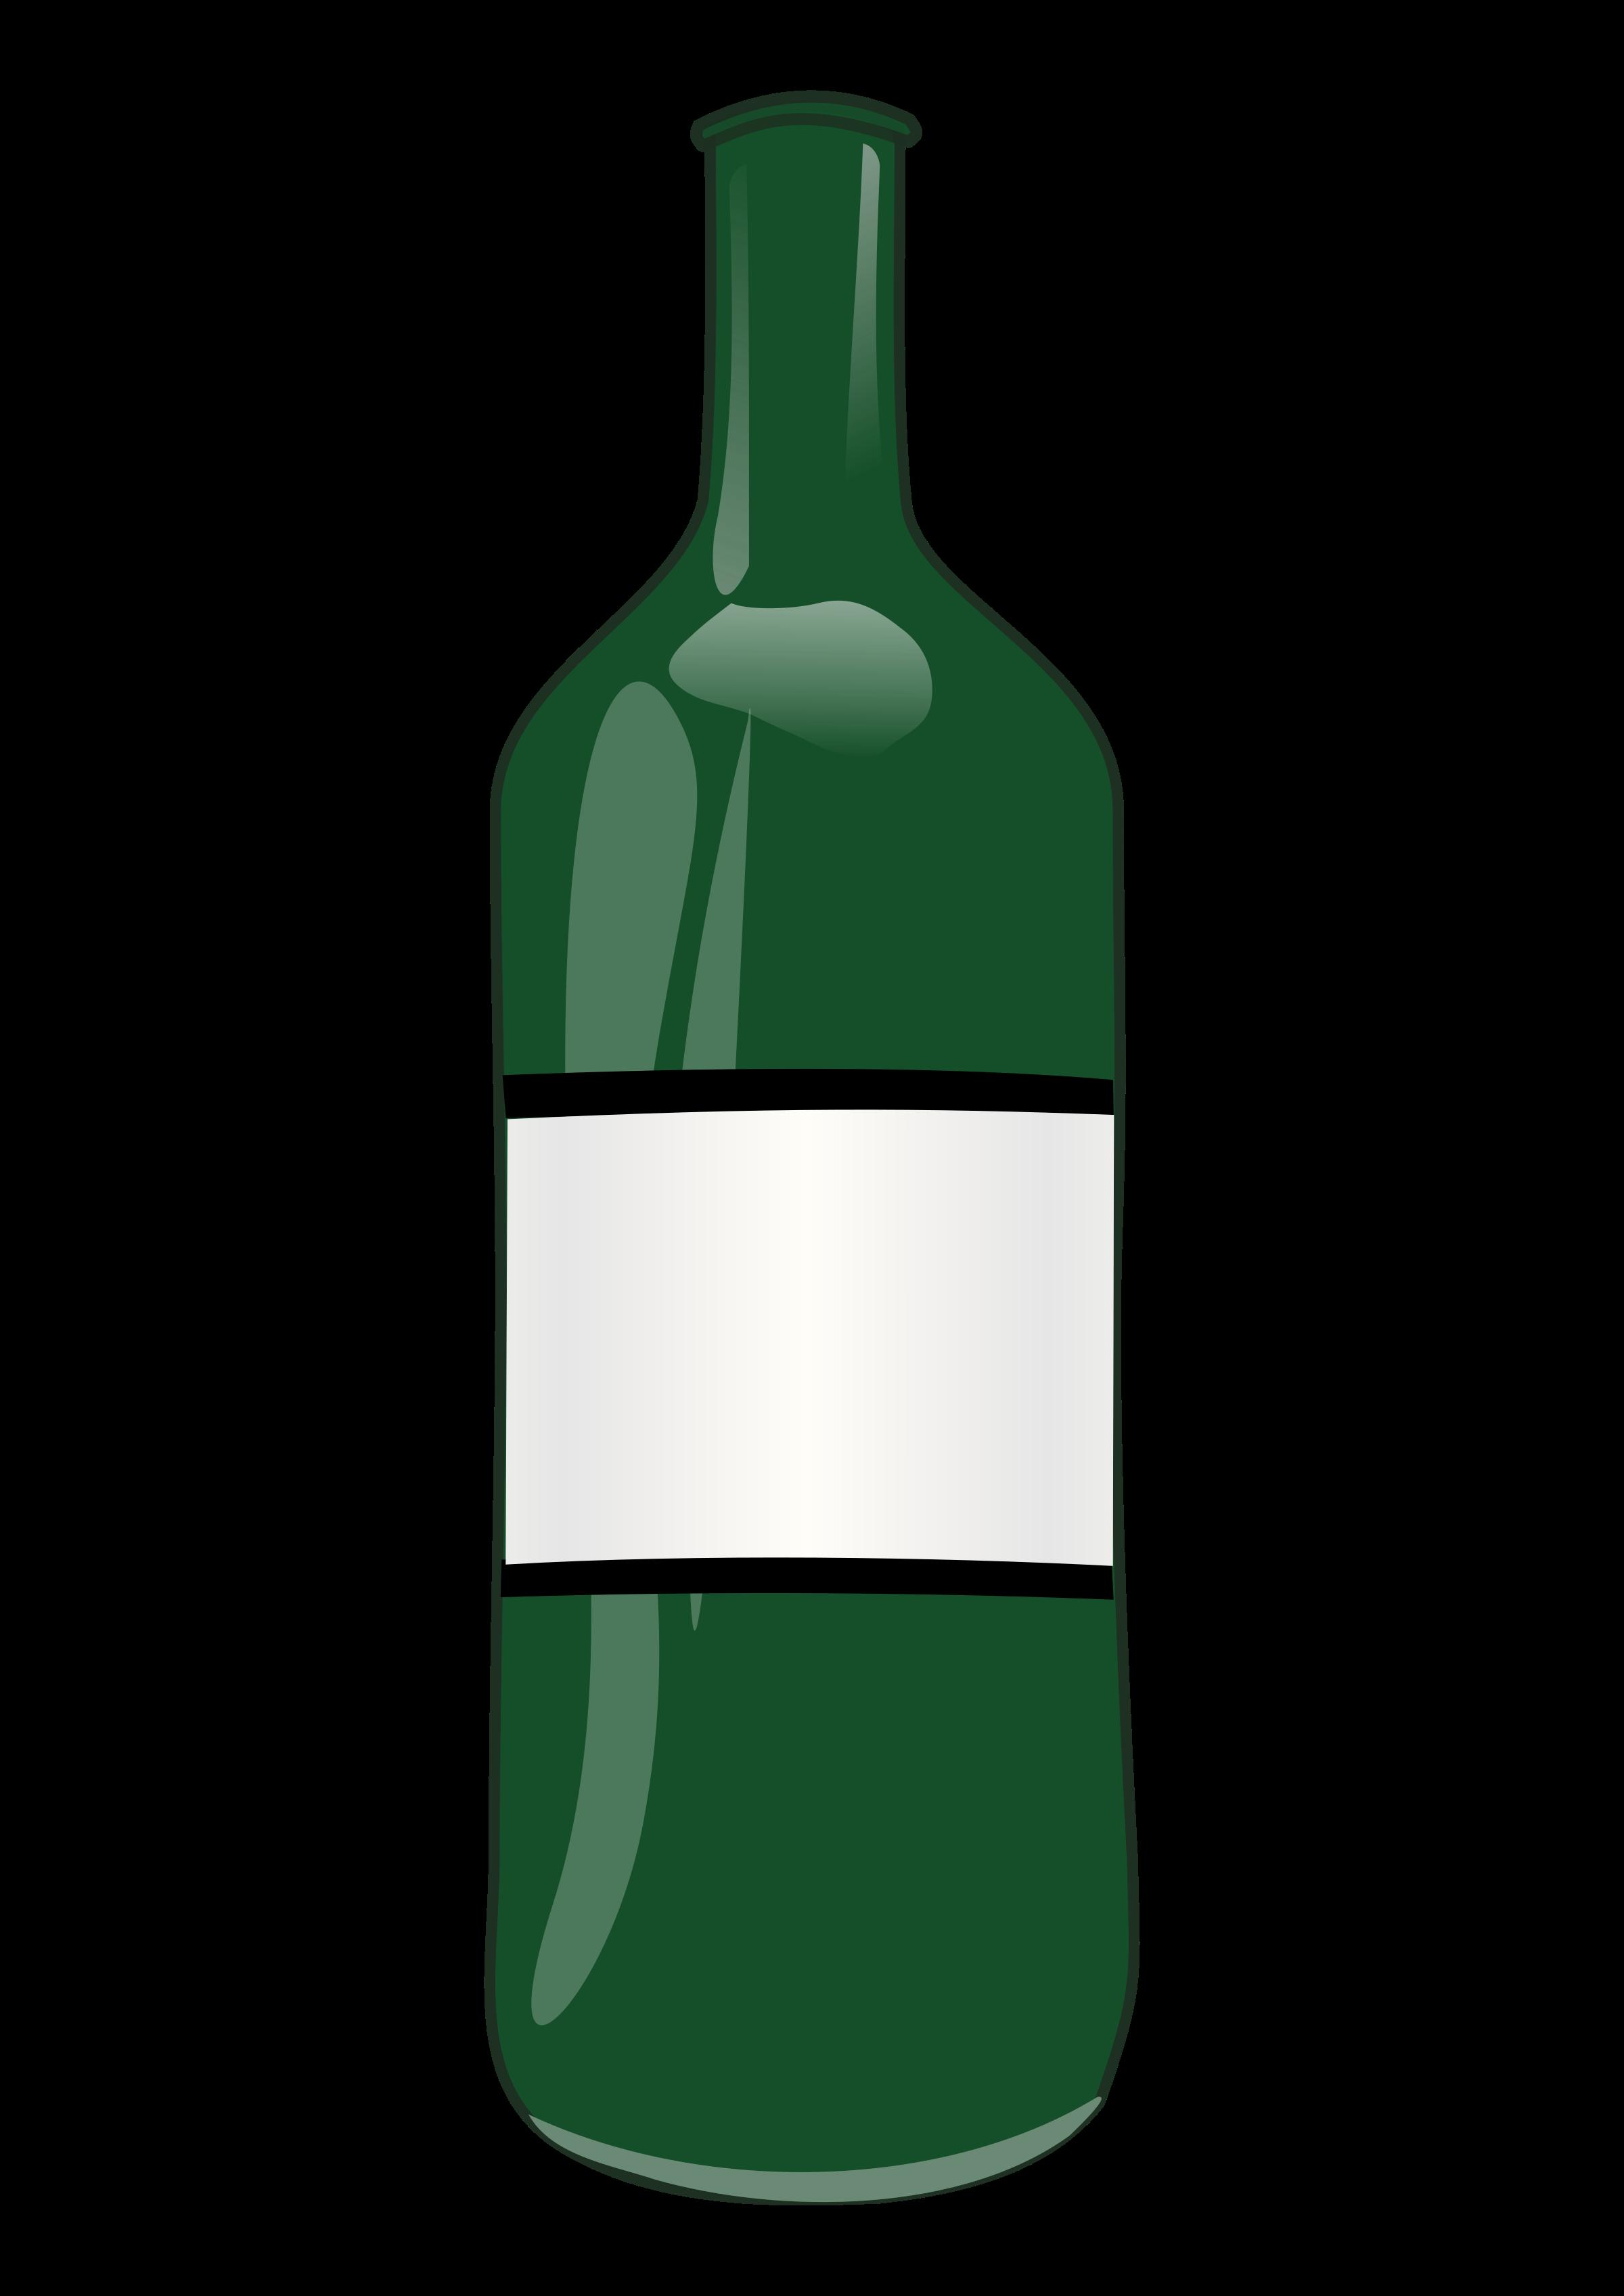 . Bottle clipart wine bottle